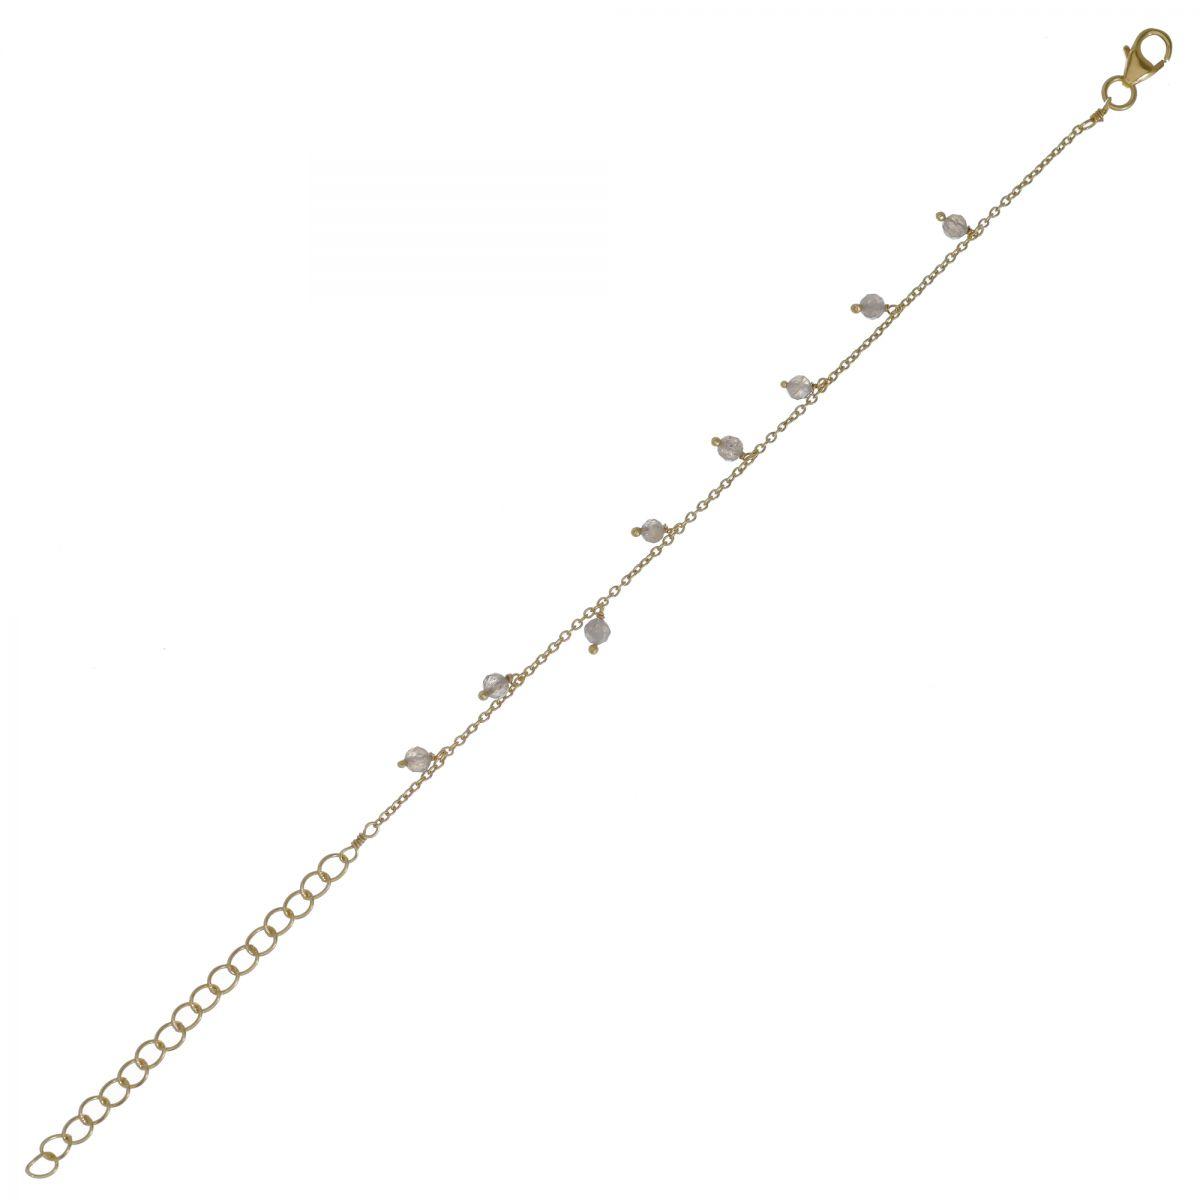 f bracelet 3mm 8 pendants labradorite beads gold plated